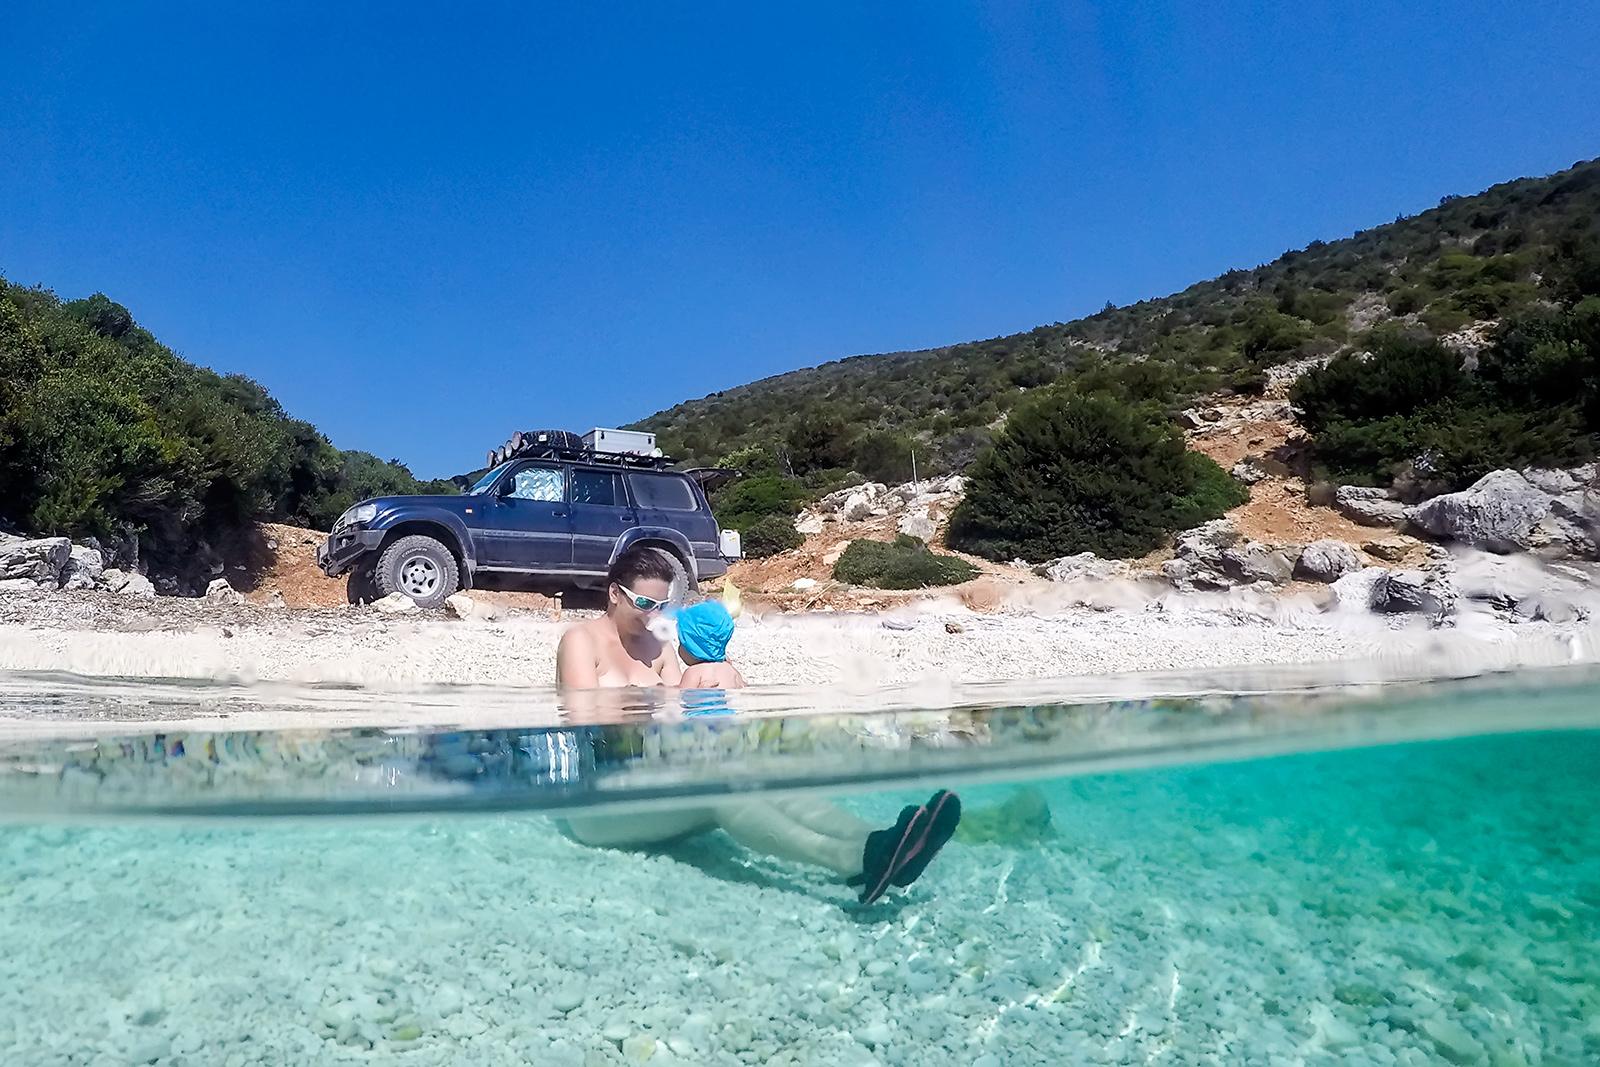 Bivouac on the beach in Greece.